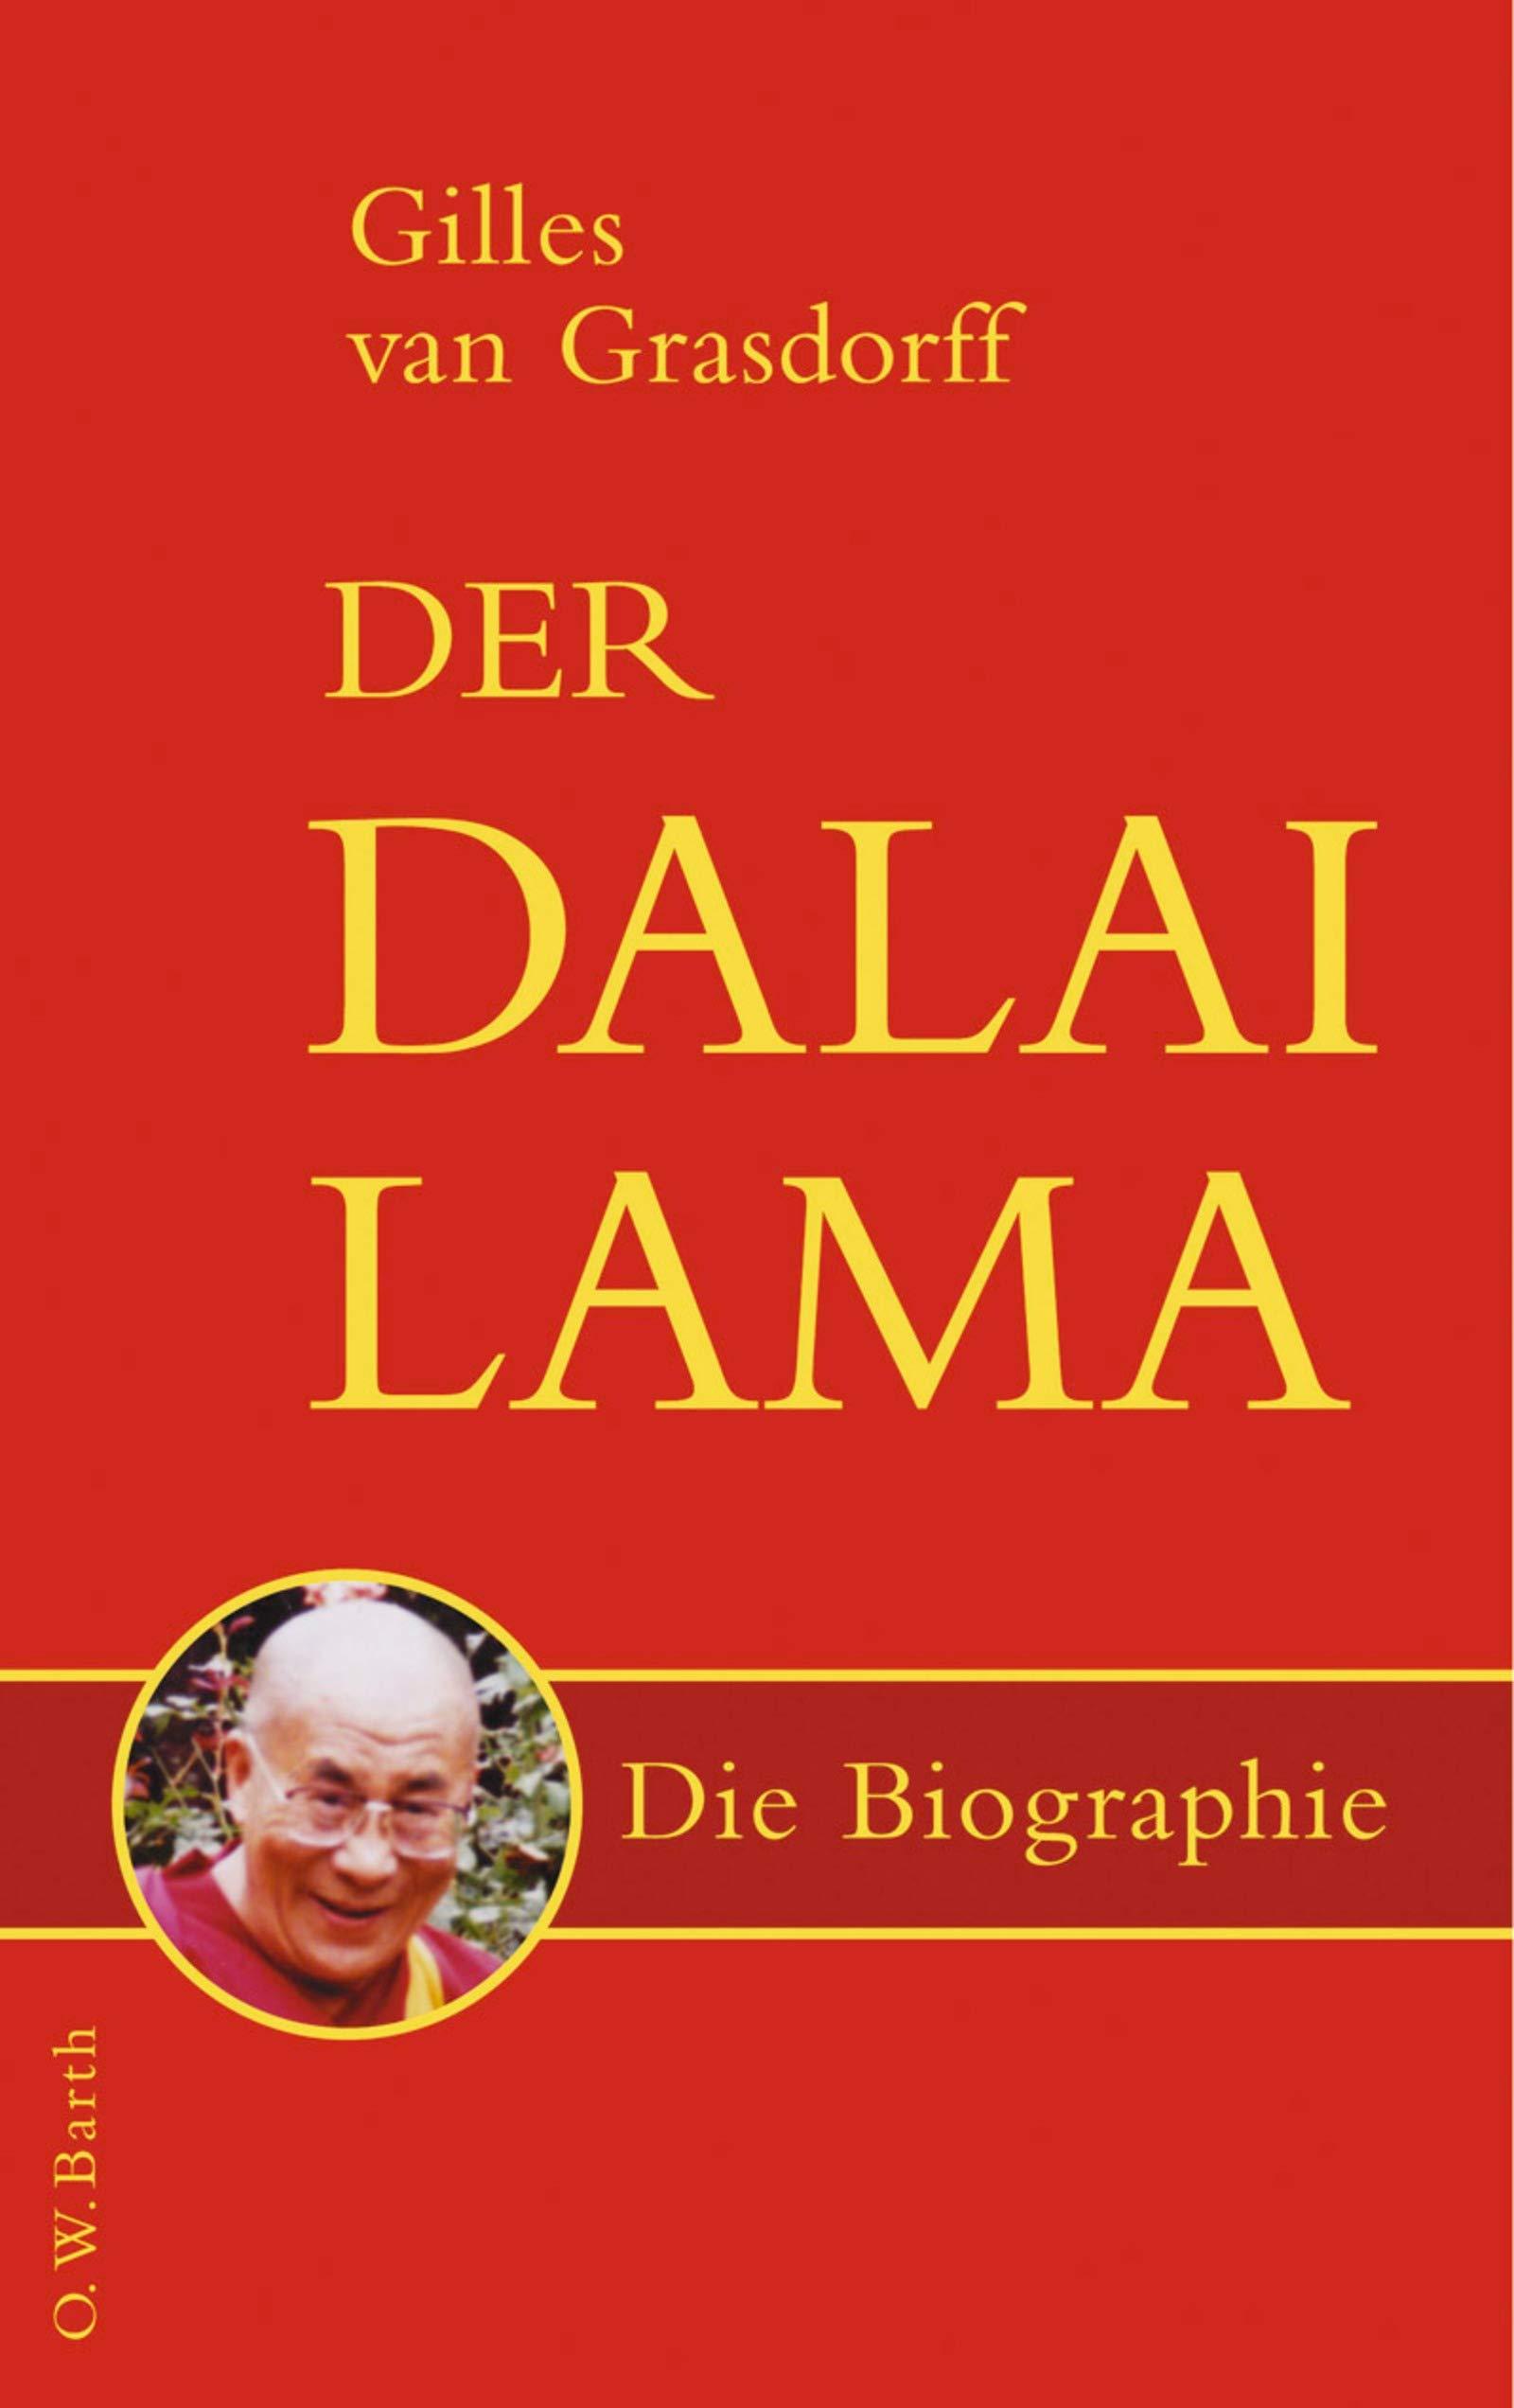 Biografie Und Lebensalltag Der 14 Dalai Lama 11